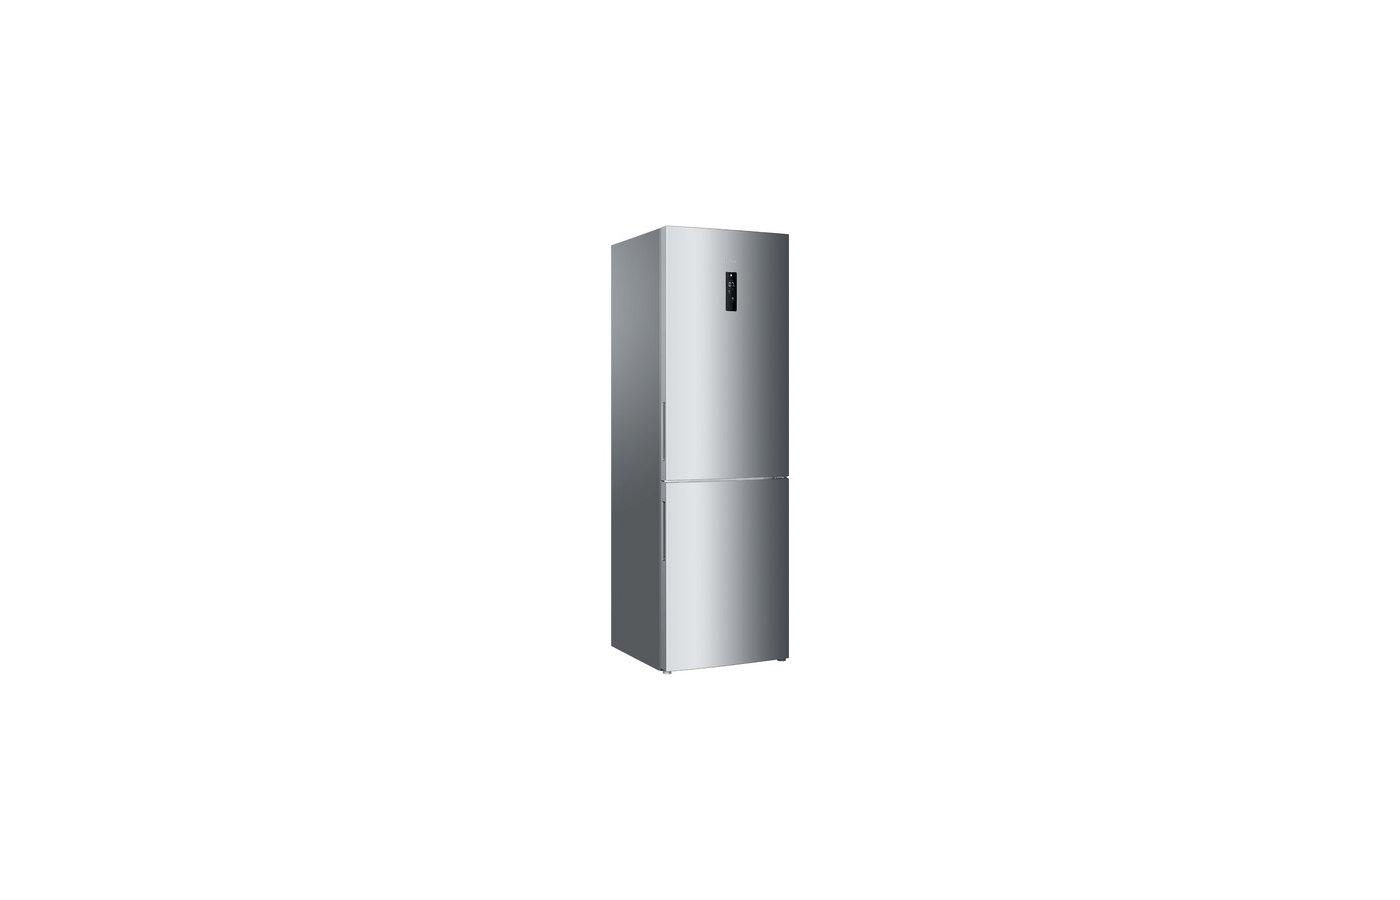 Холодильник HAIER C2 FE 636 CSJRU